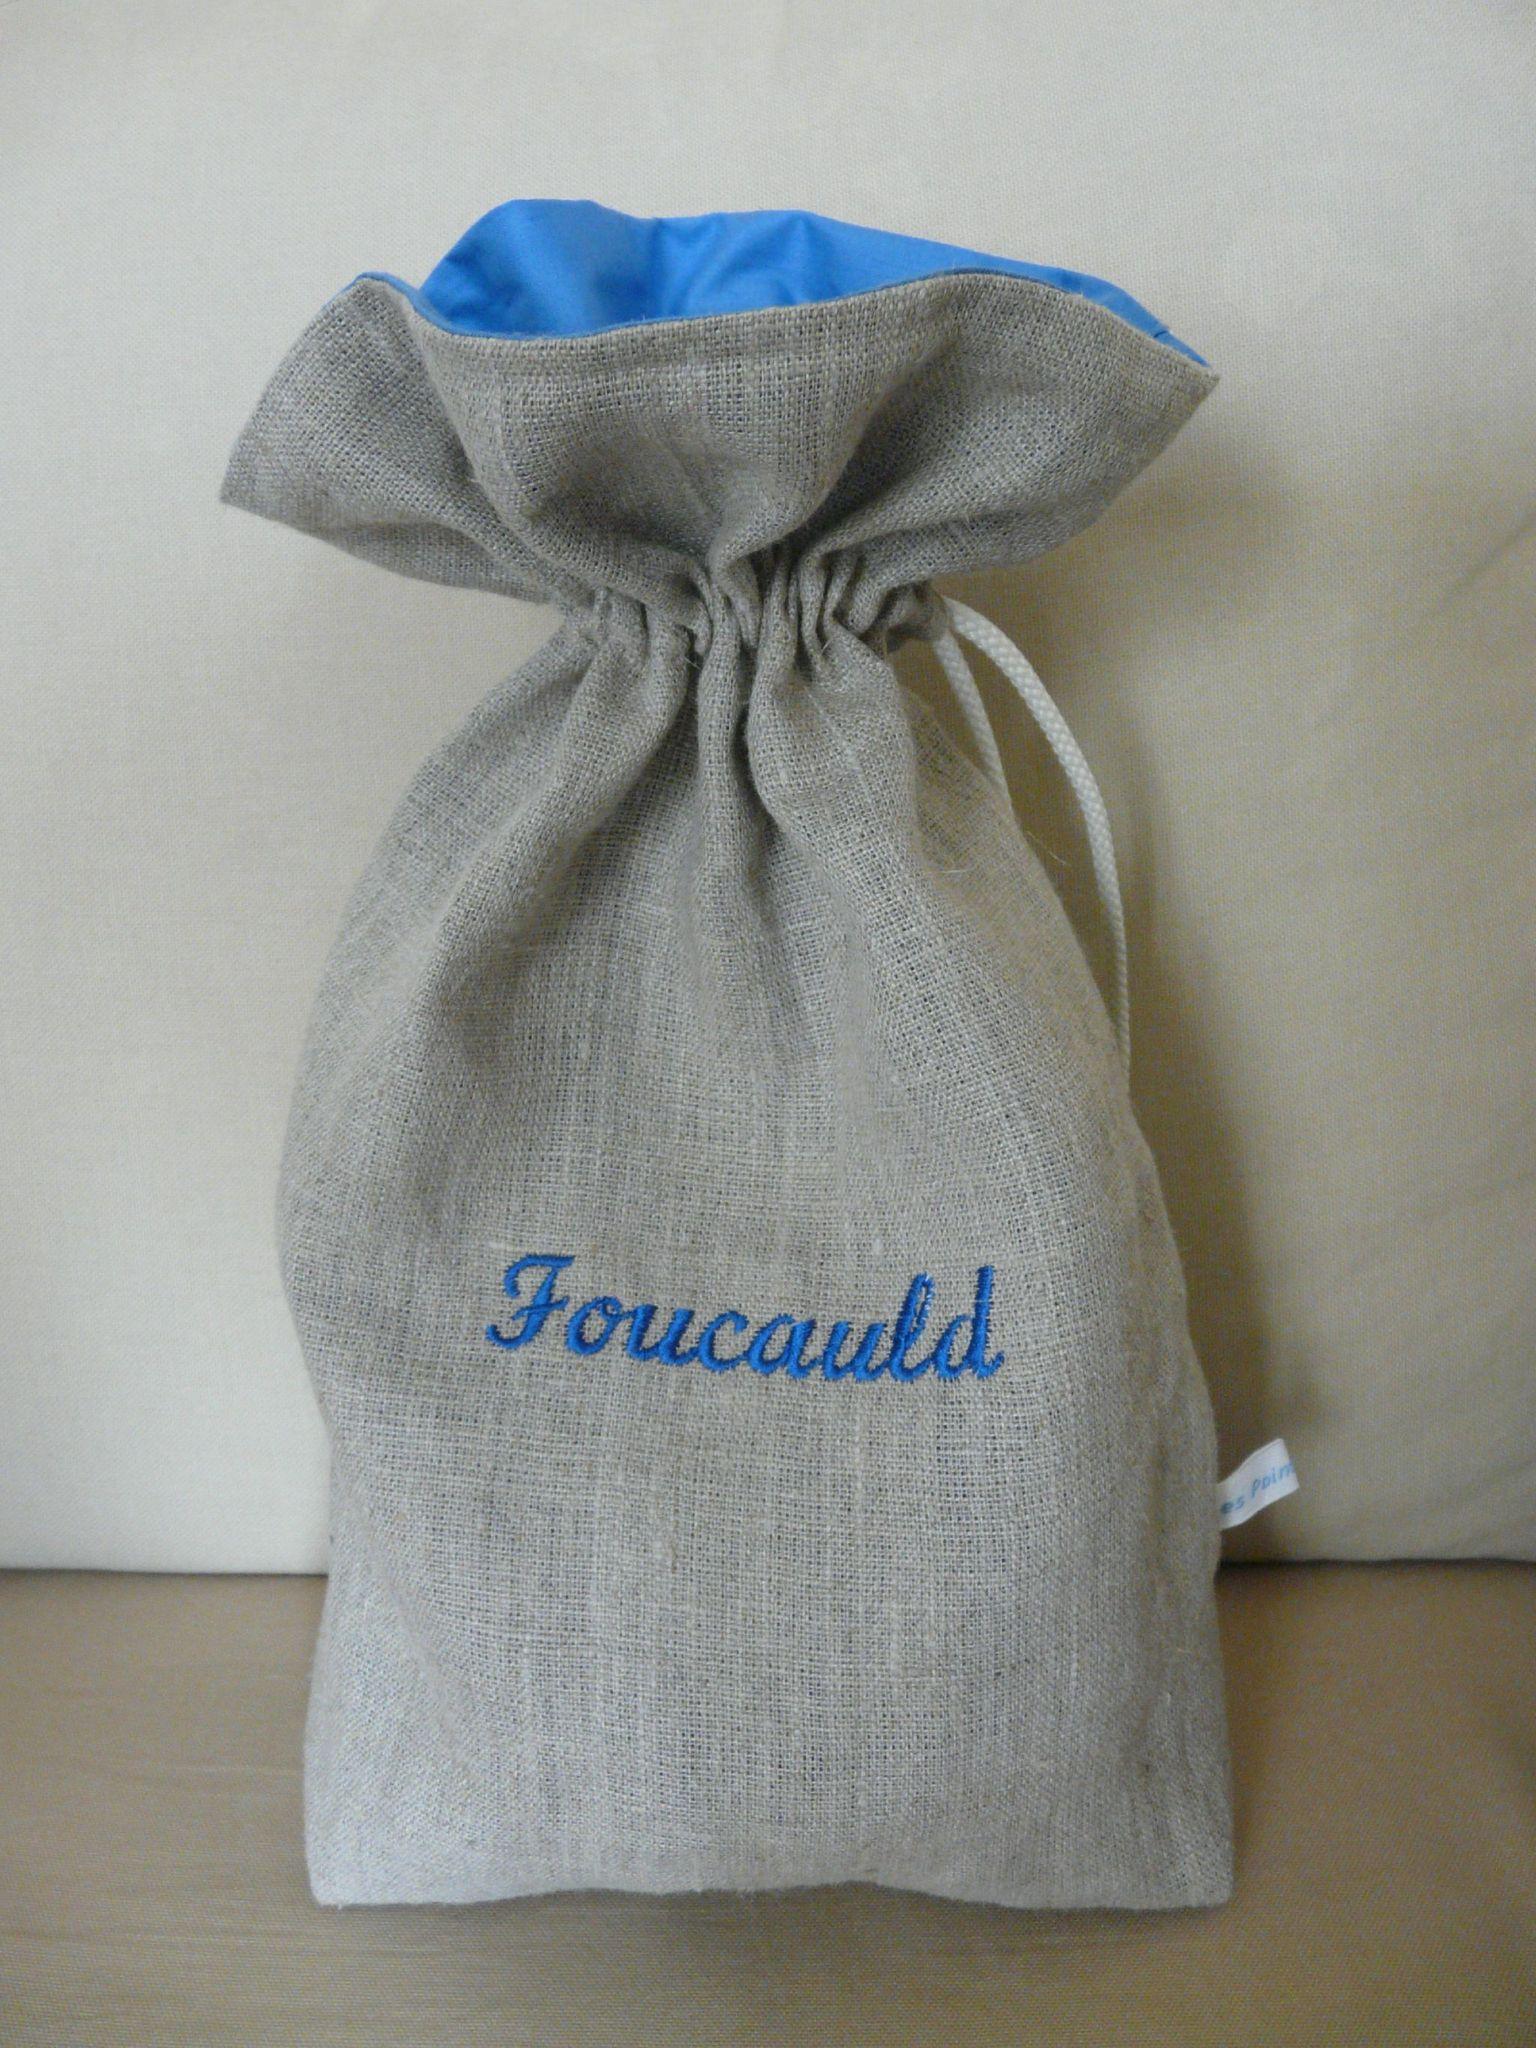 Sac Bauchon Foucauld